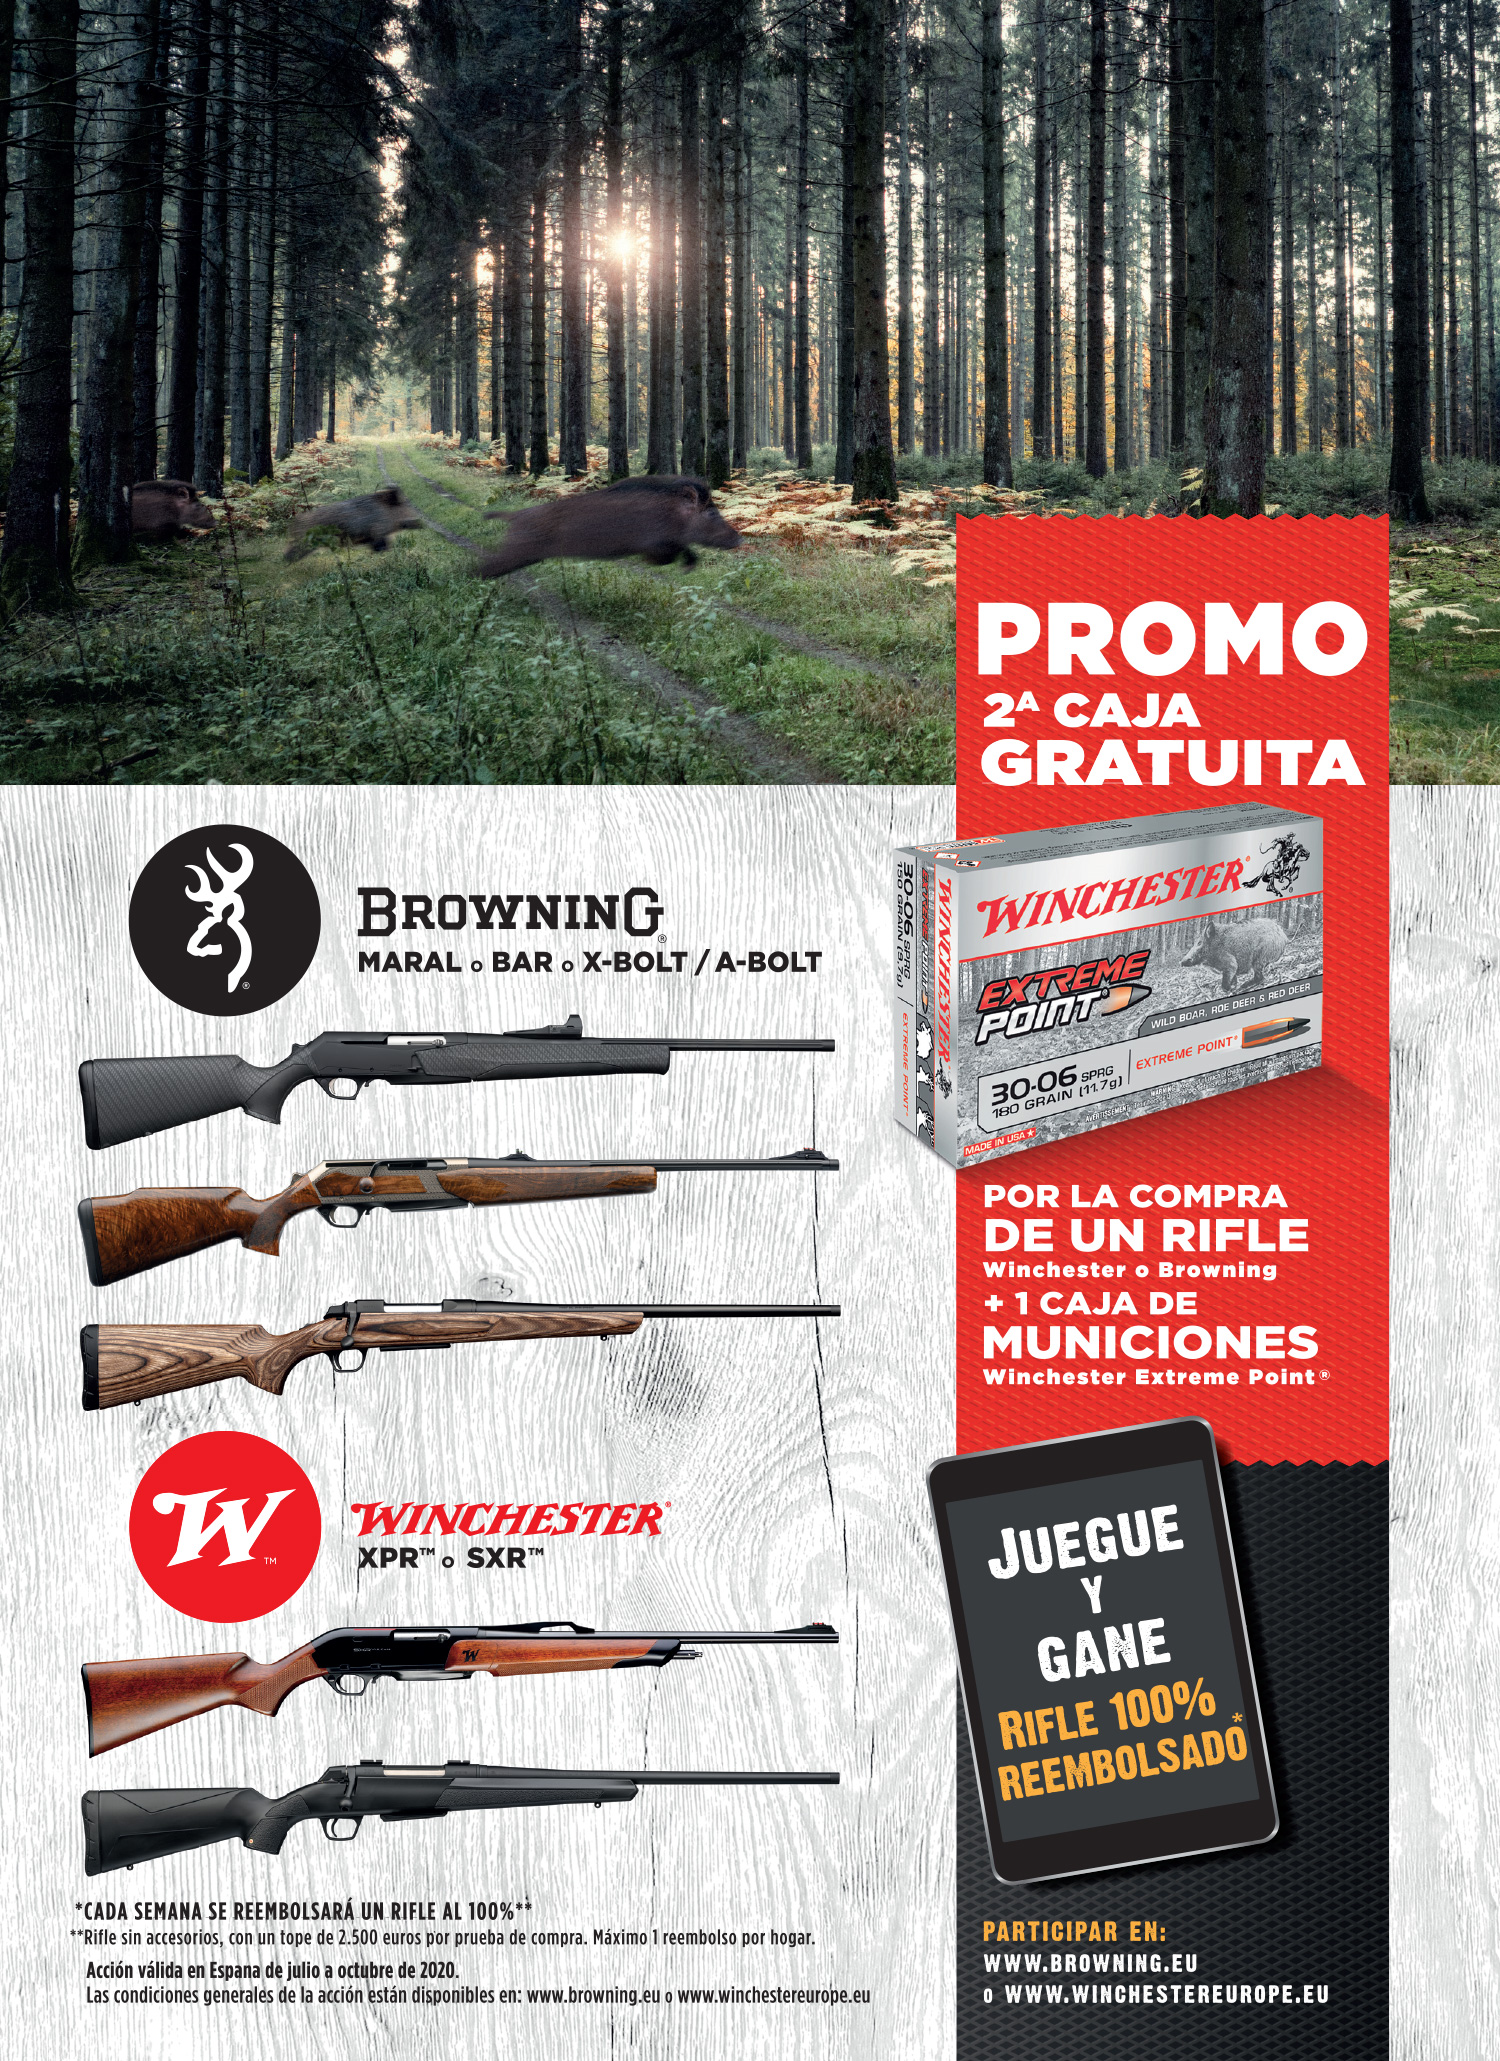 promo 2a caja de municiones gratuita